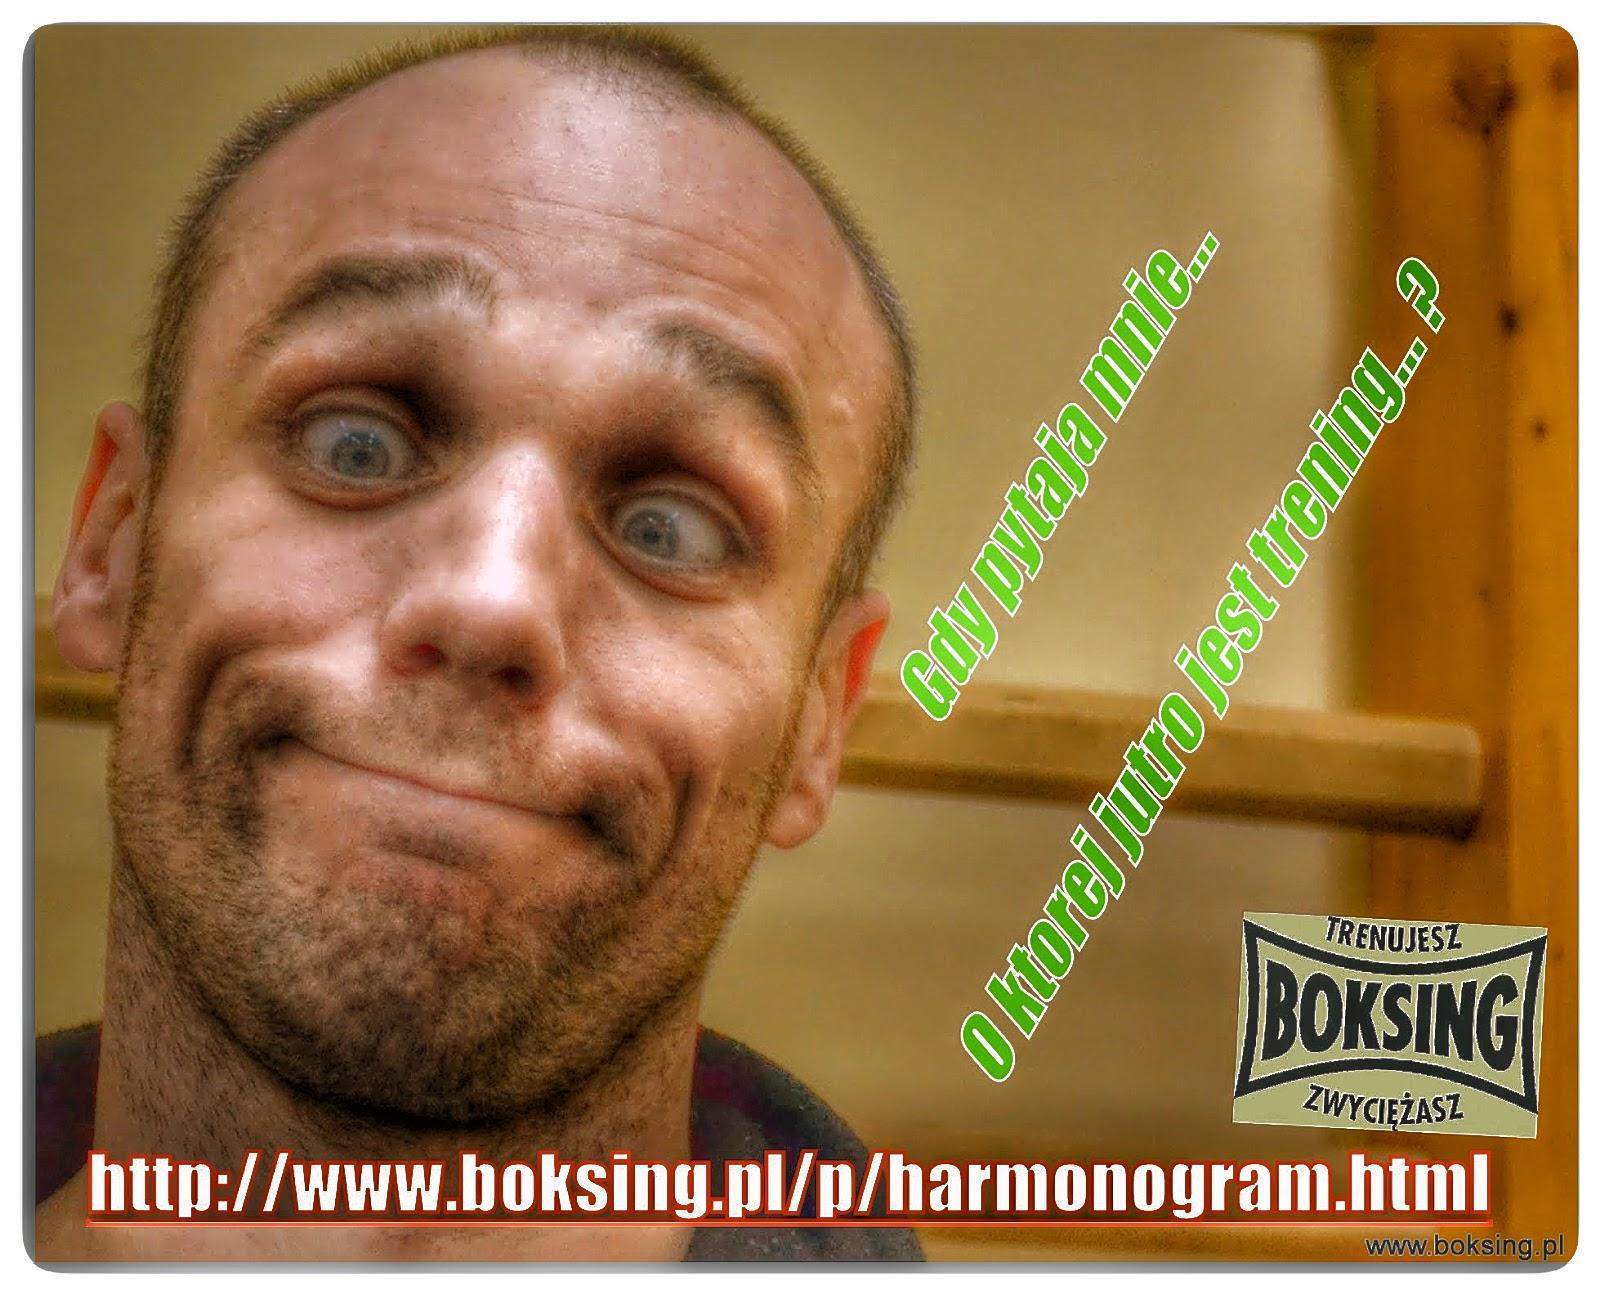 Bogumił Połoński, harmonogram, SKF Boksing Zielona Góra, treningi, sport, boks, kickboxing, muay thai